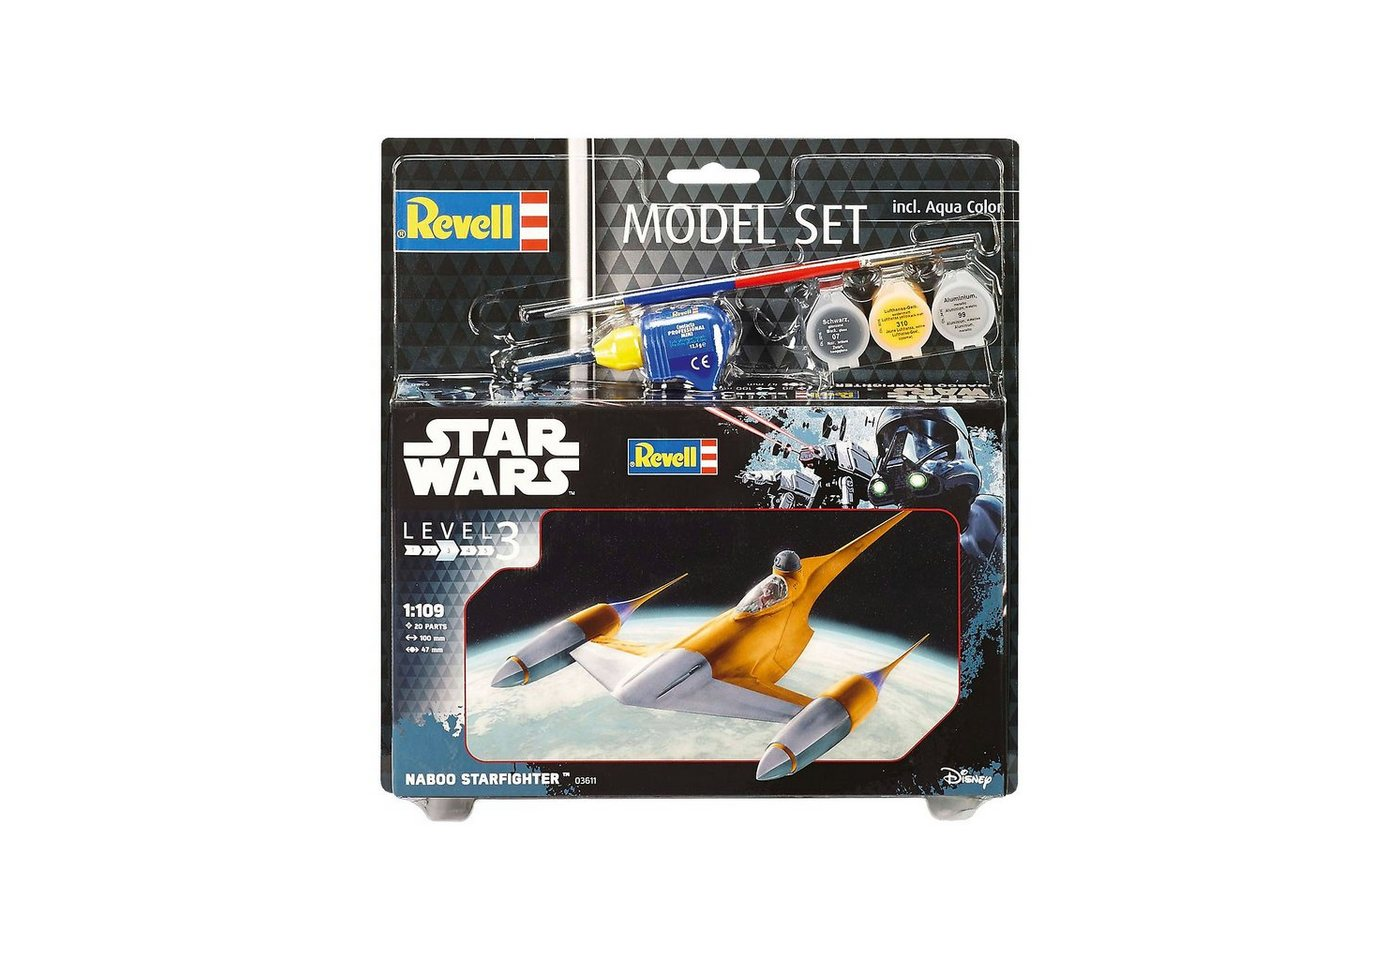 Revell® Modellbausatz - Model Set Star Wars Naboo Starfighter